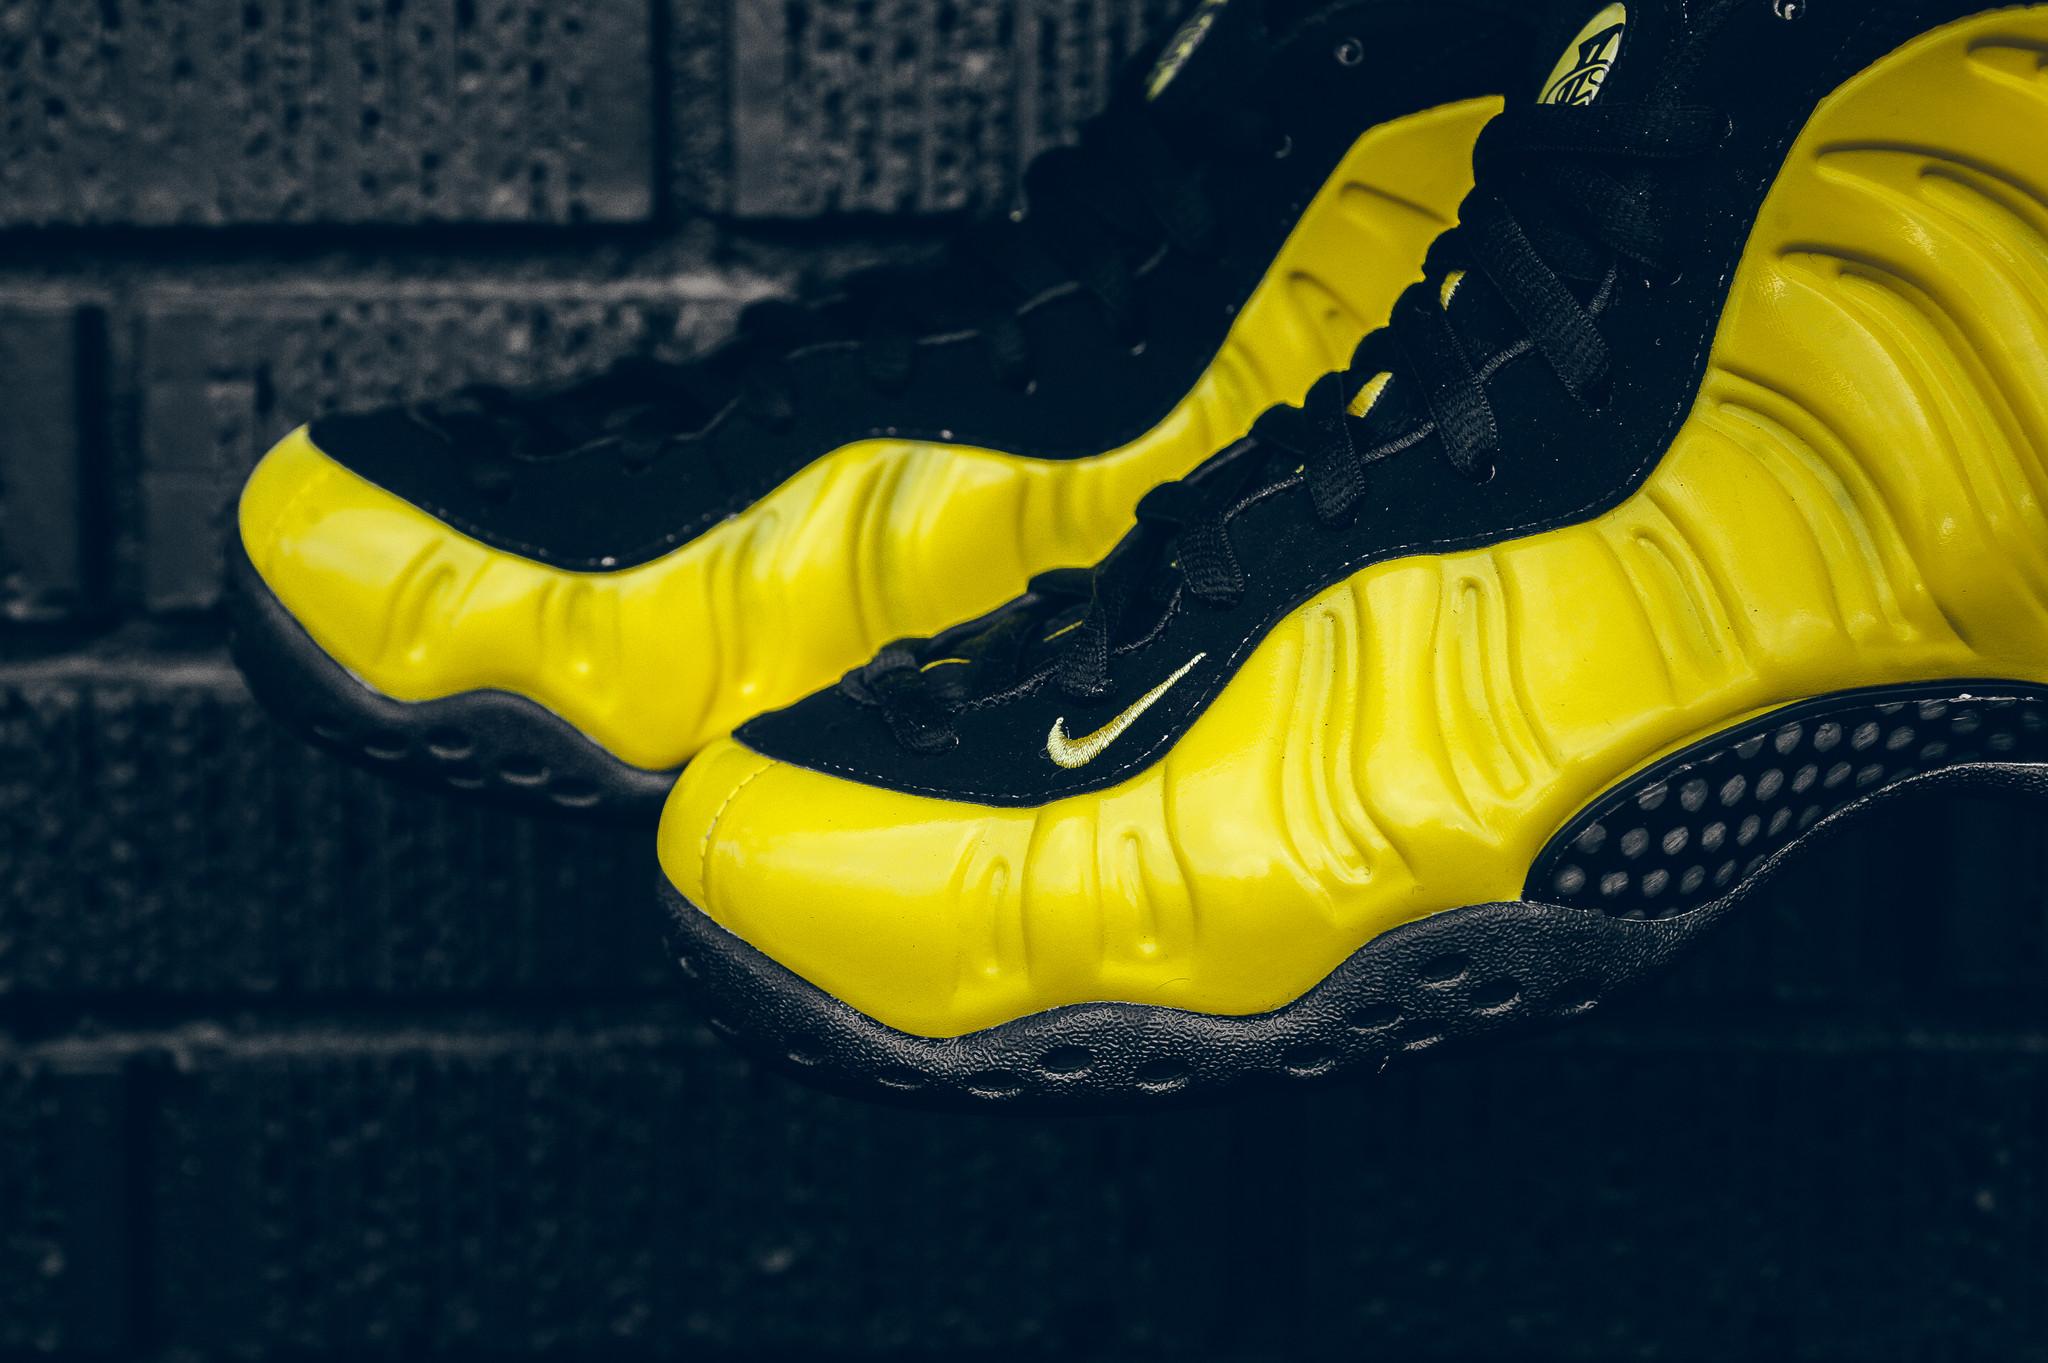 chaussure Nike Air Foamposite 'Wu Tang' (6)